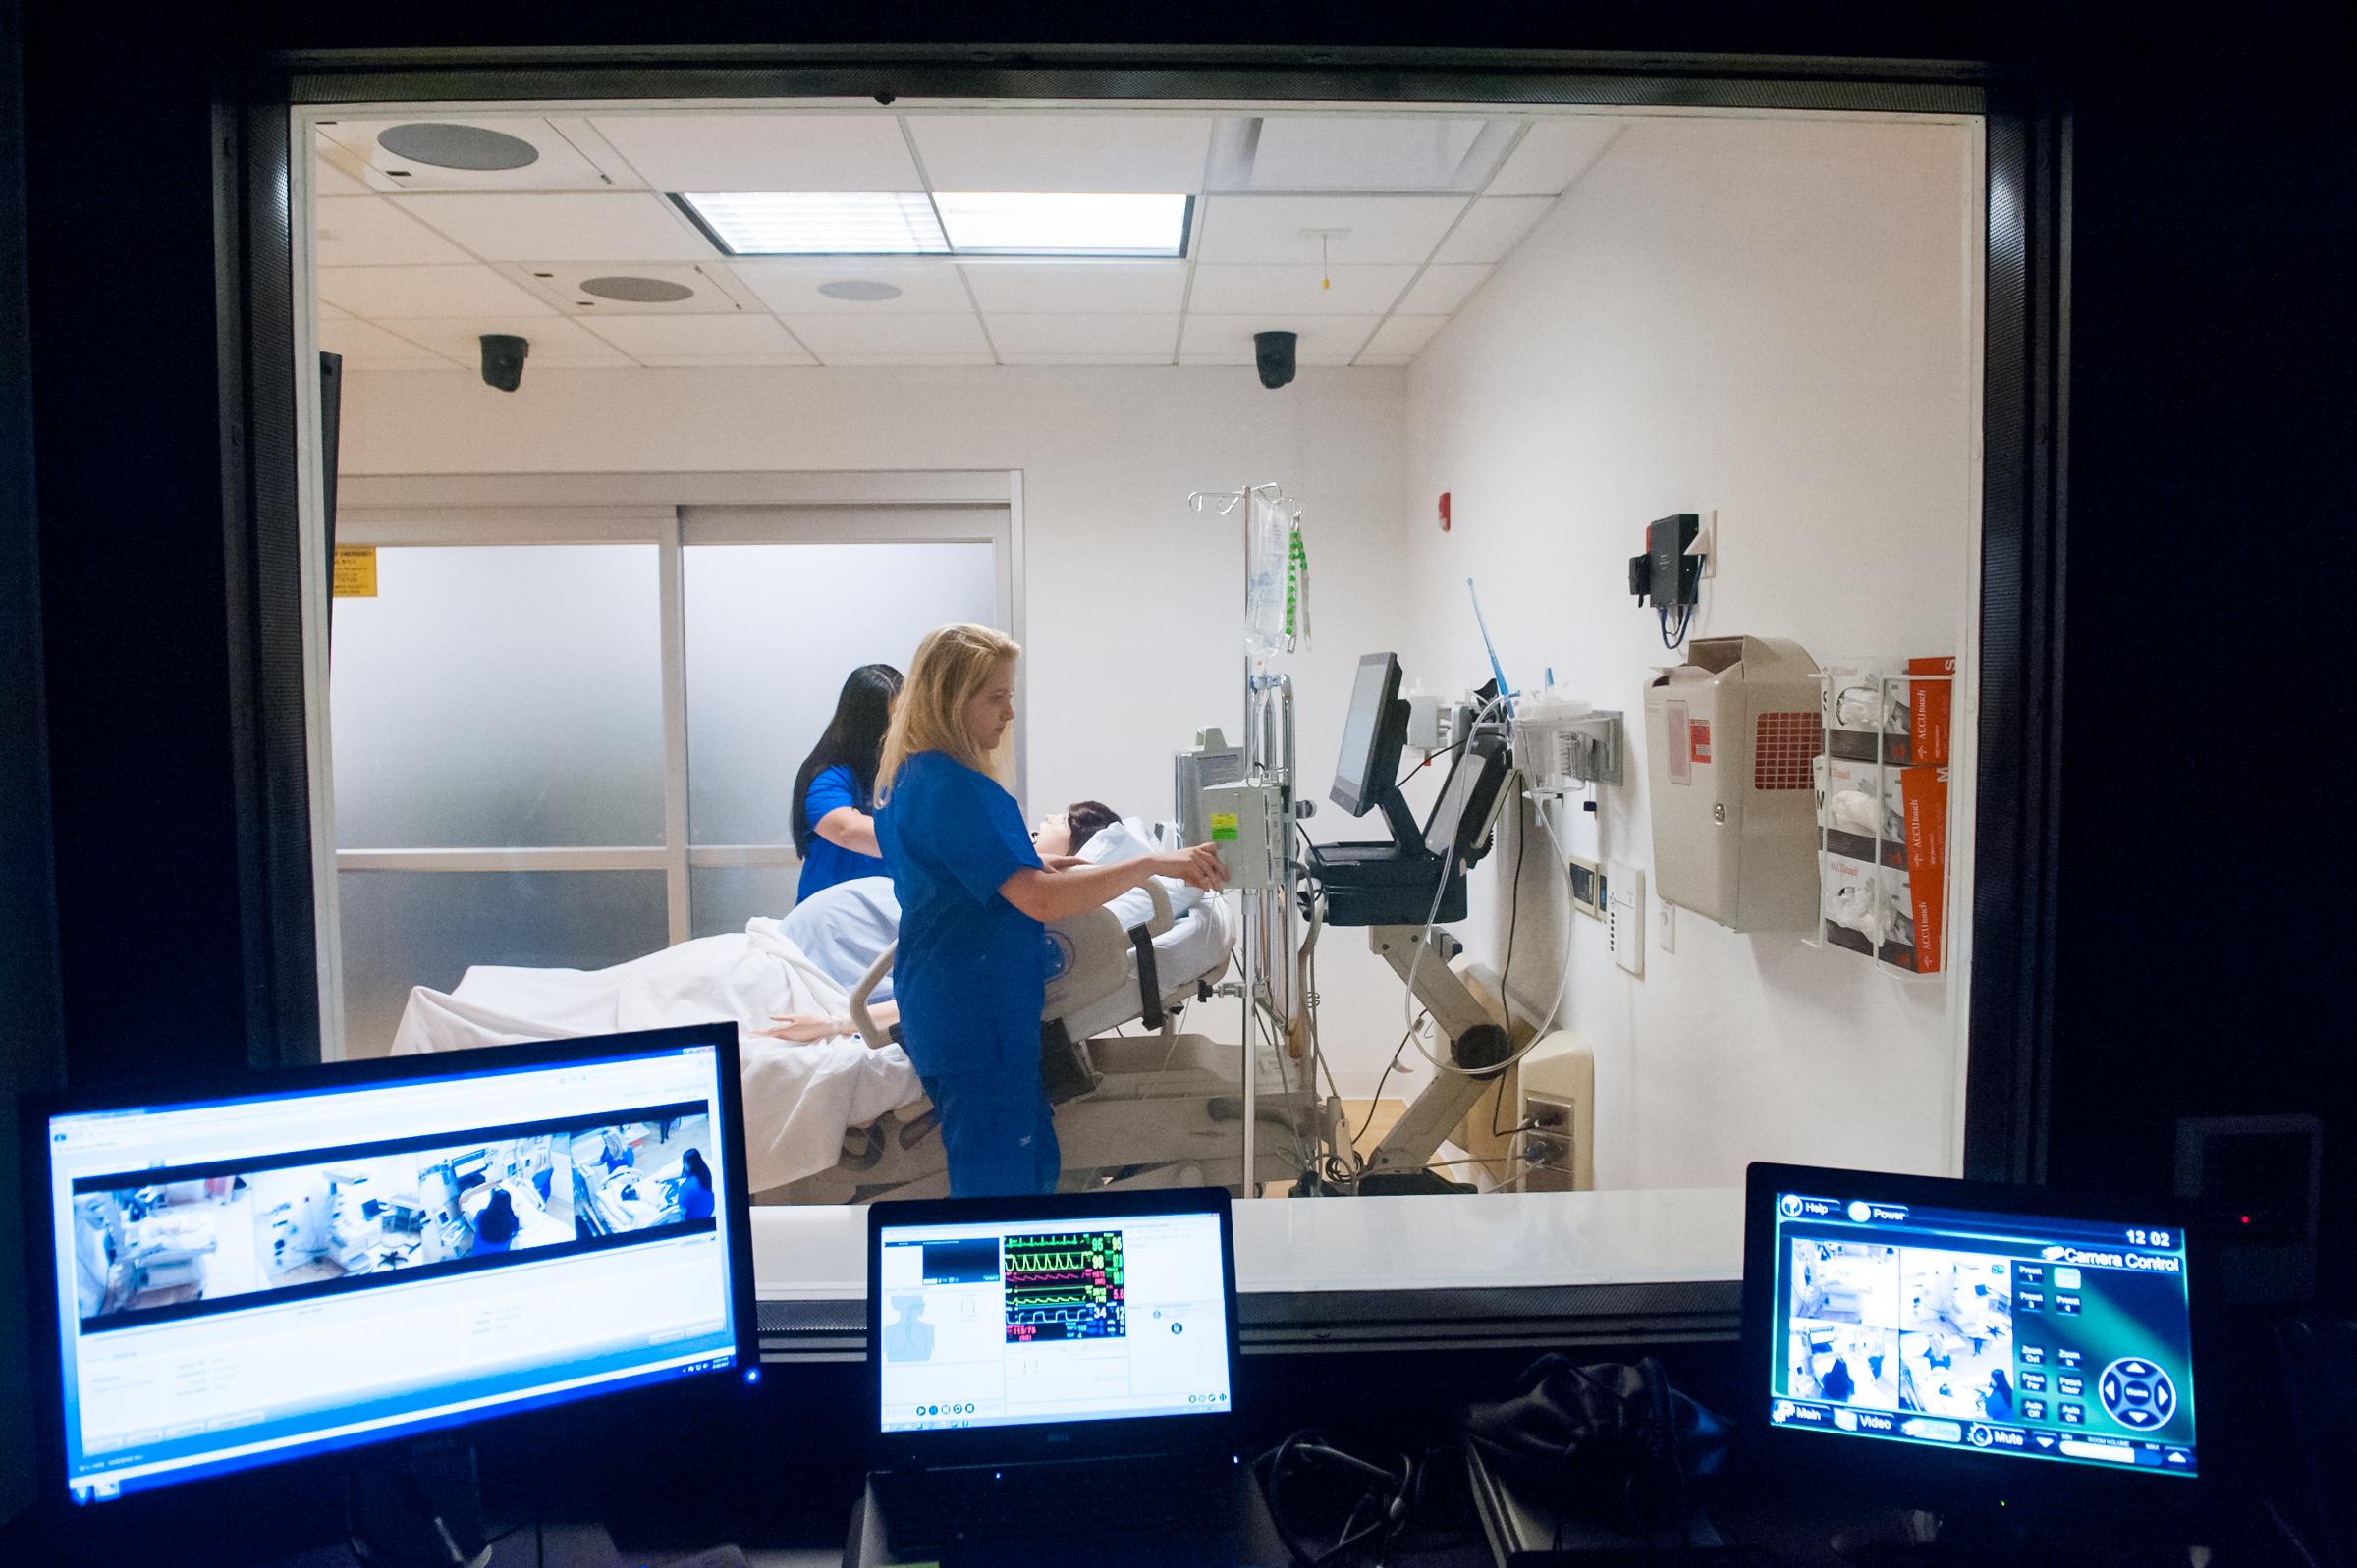 Nursing (BSN) featured image background